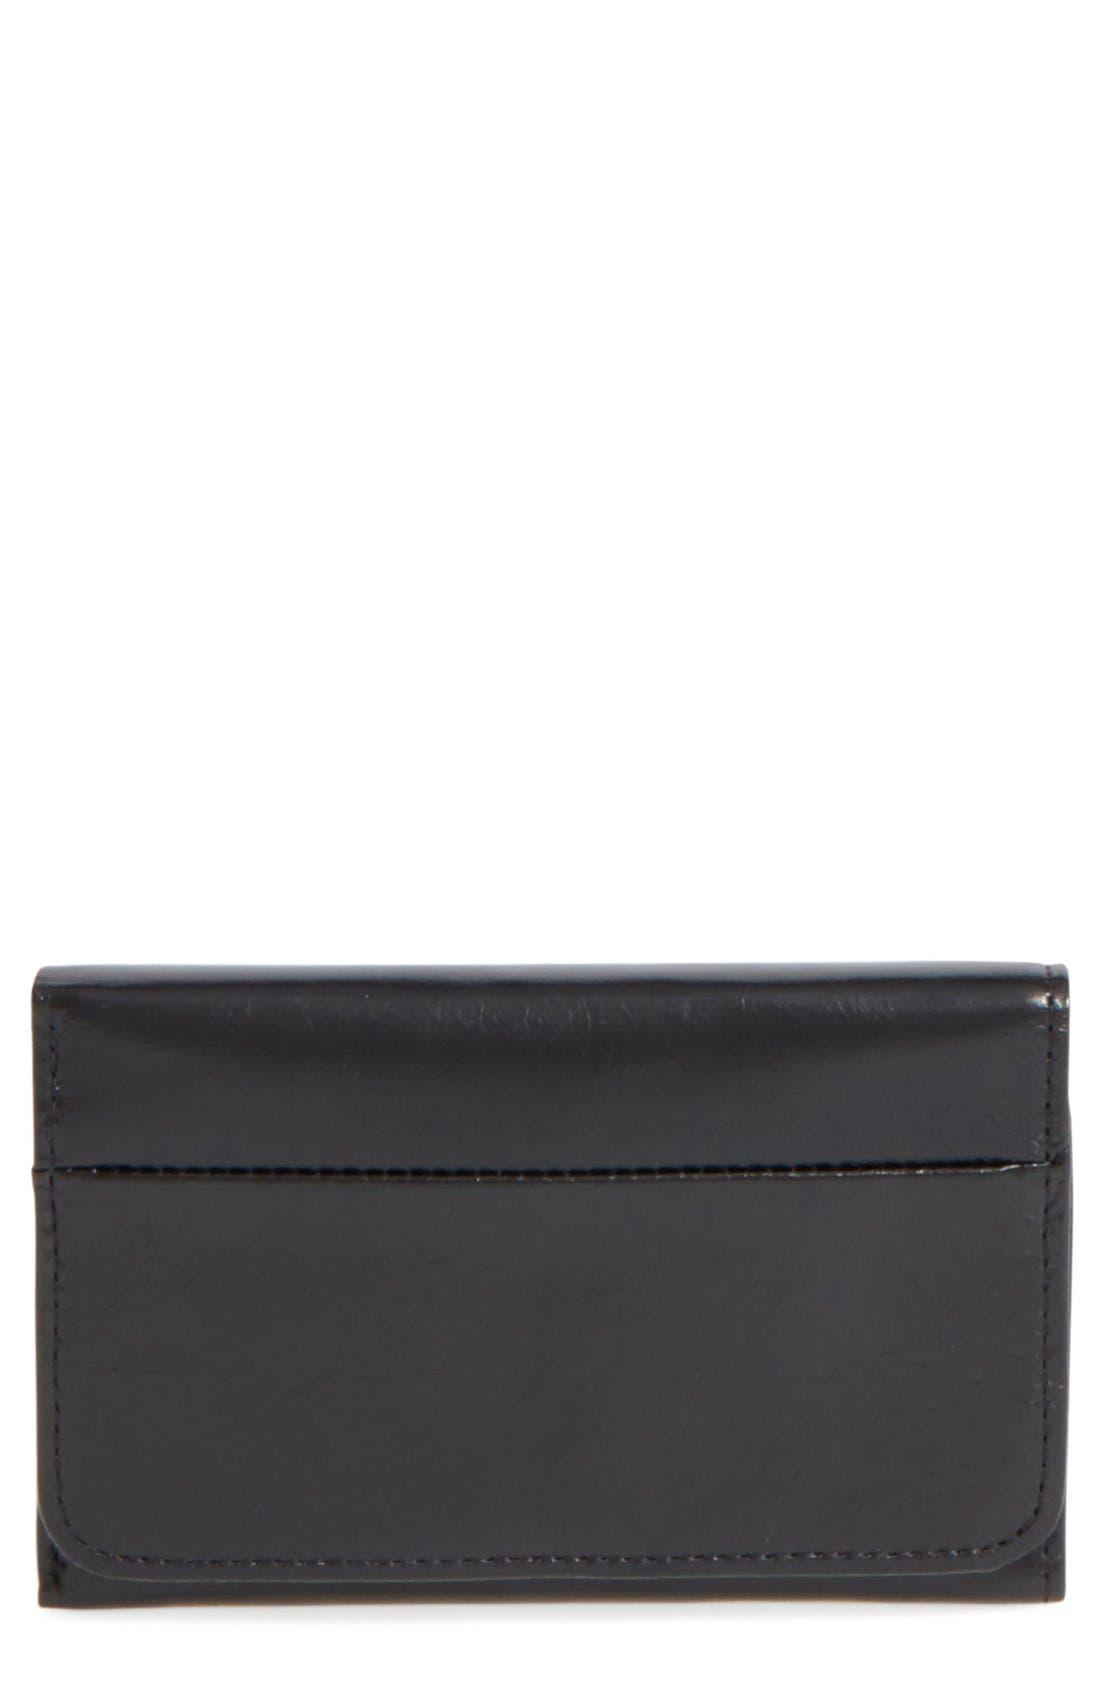 Jill Trifold Wallet,                         Main,                         color, BLACK